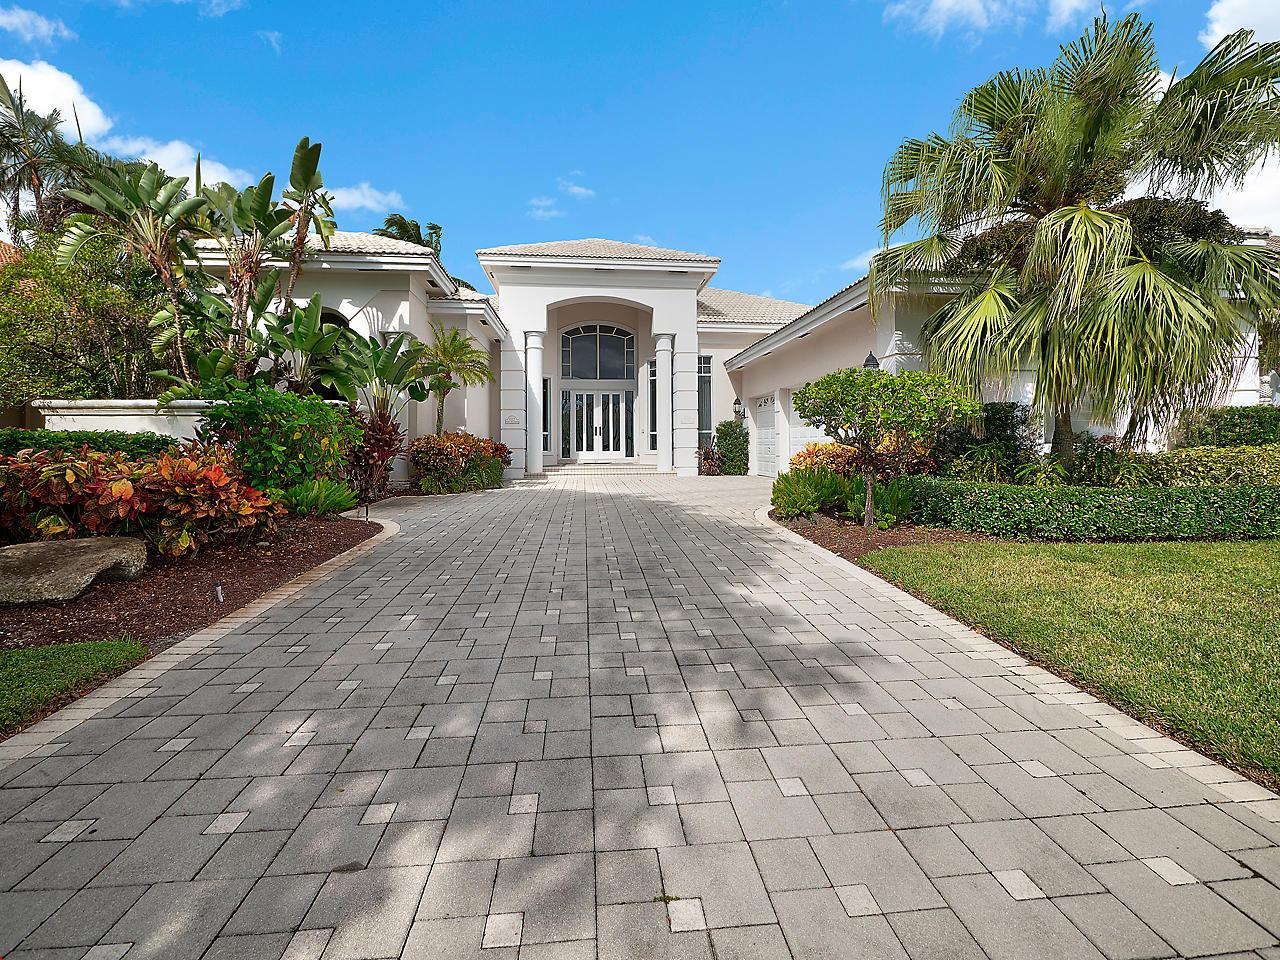 1027 Grand Isle Terrace, Palm Beach Gardens, Florida 33418, 4 Bedrooms Bedrooms, ,4 BathroomsBathrooms,Single Family,For Sale,GRAND ISLE,Grand Isle,RX-10475133